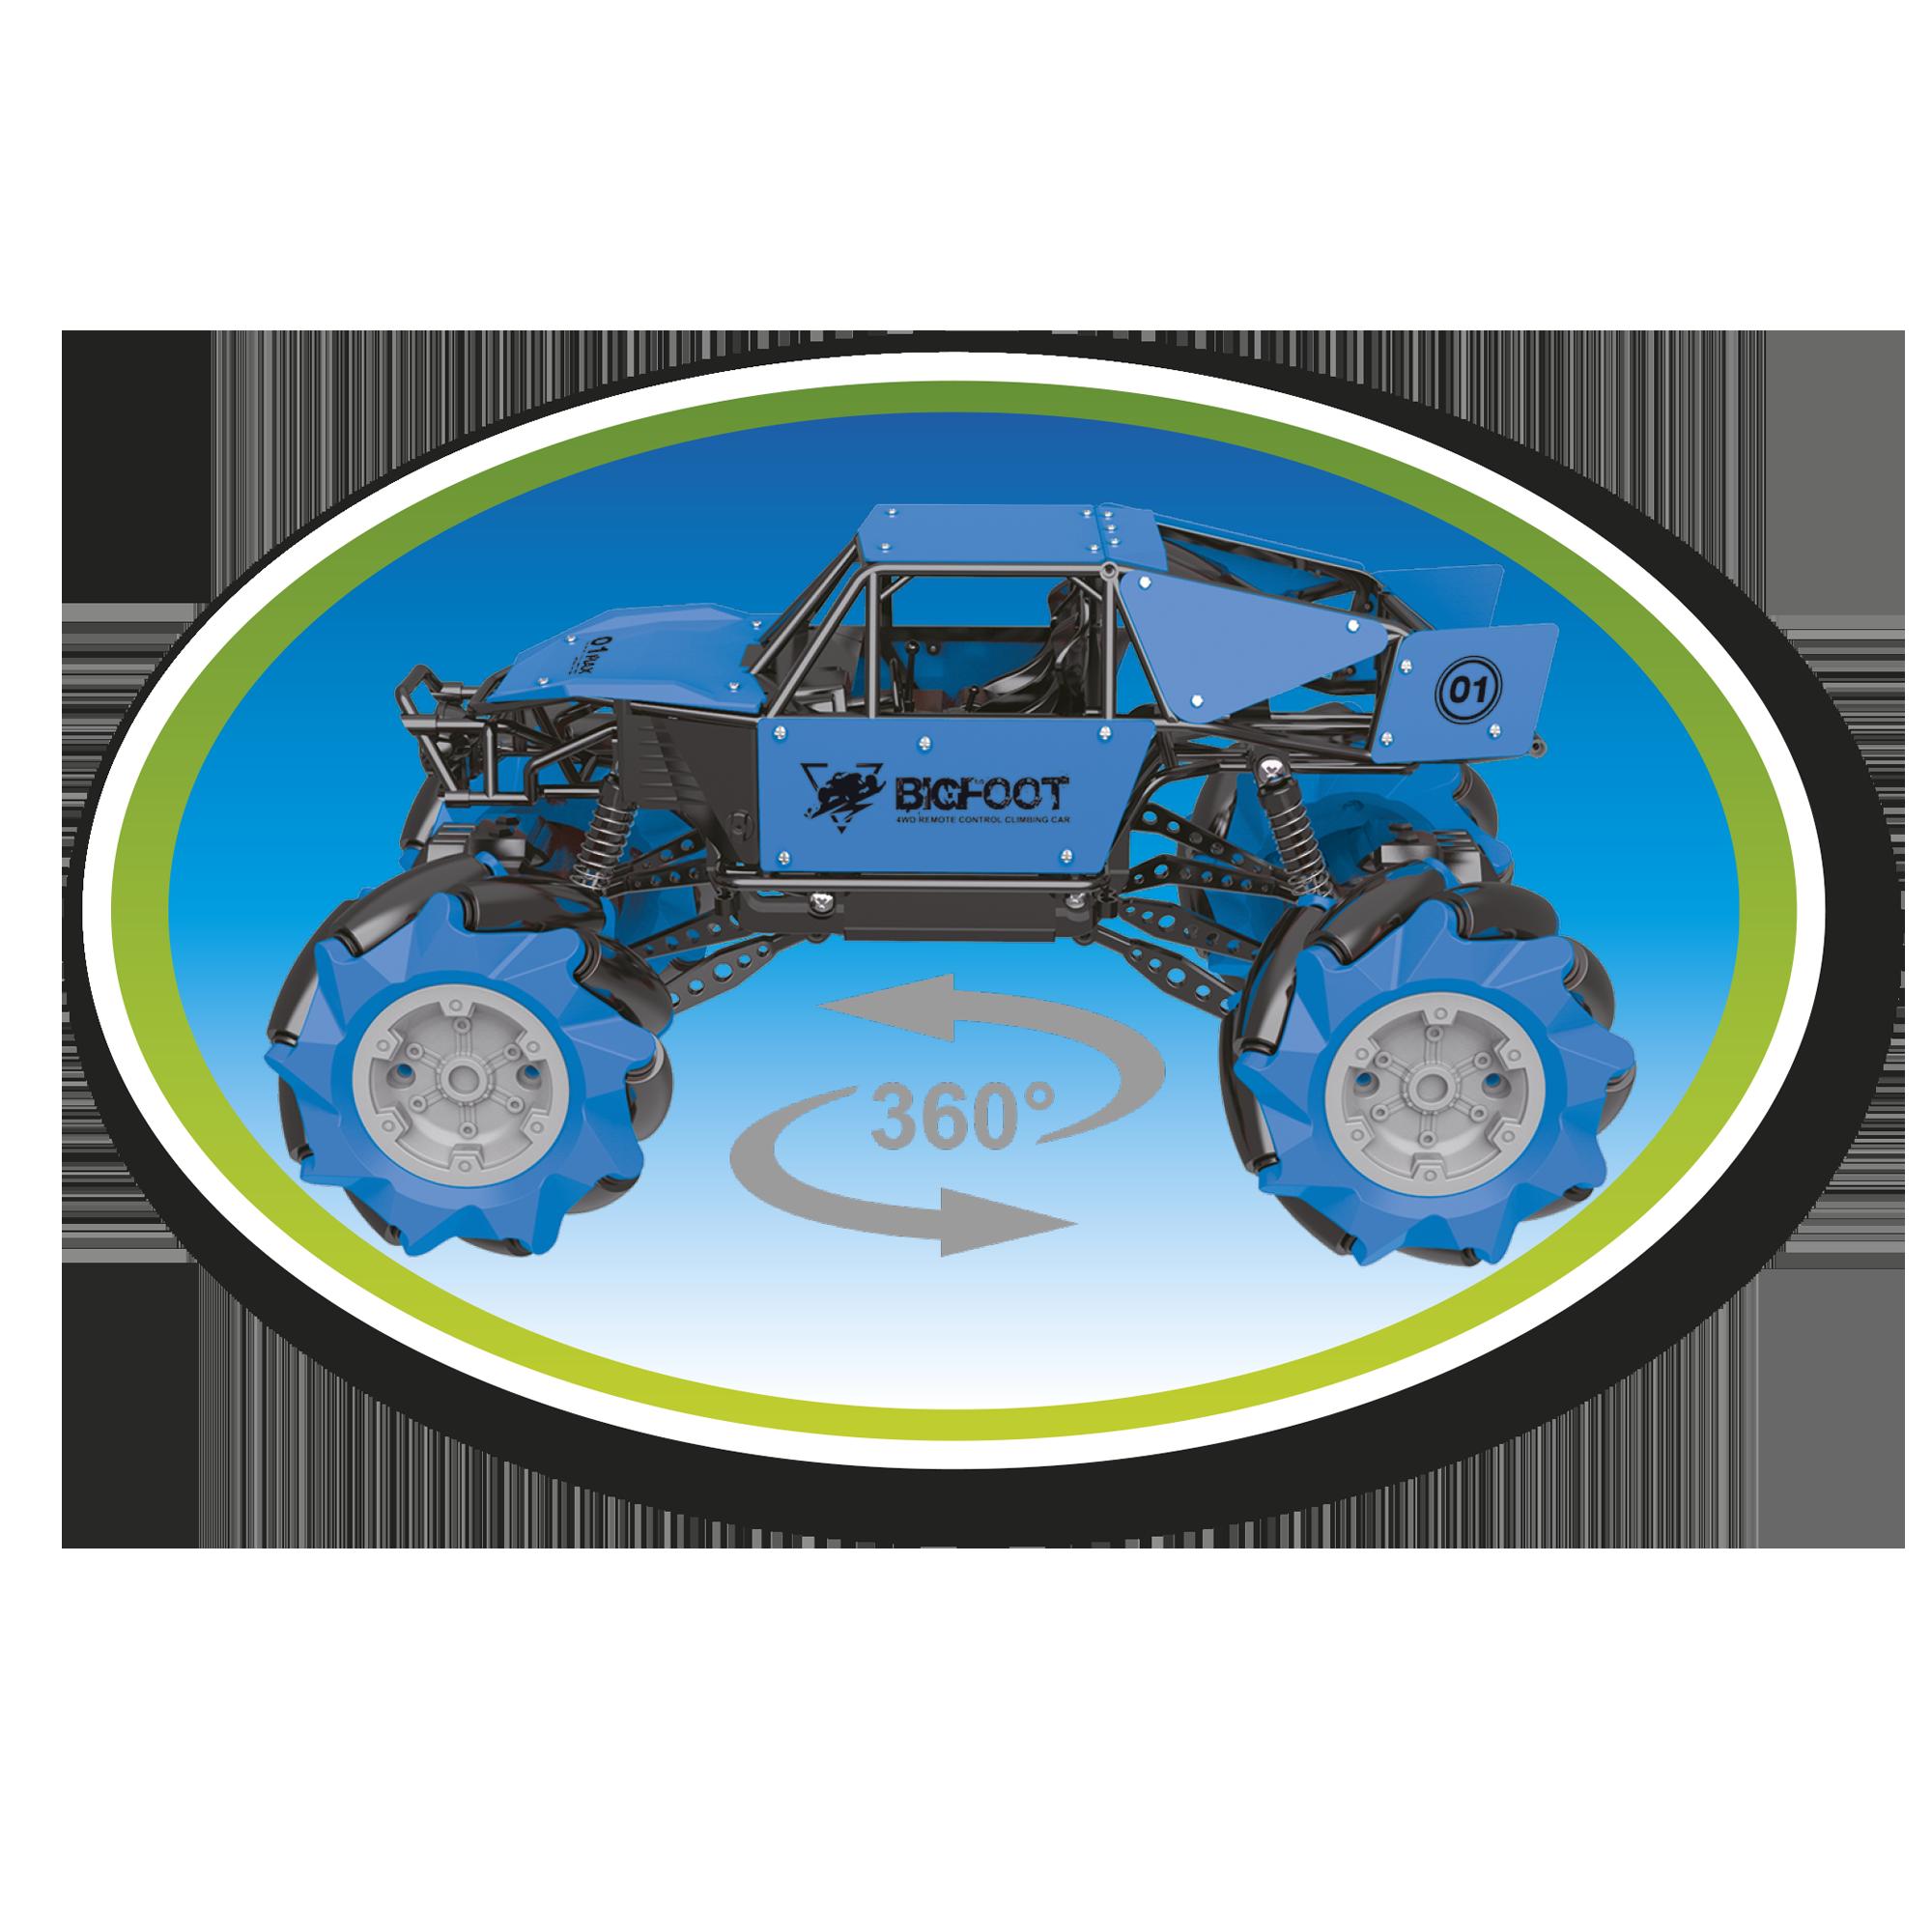 Auto r/c drift king - MOTOR&CO R/C